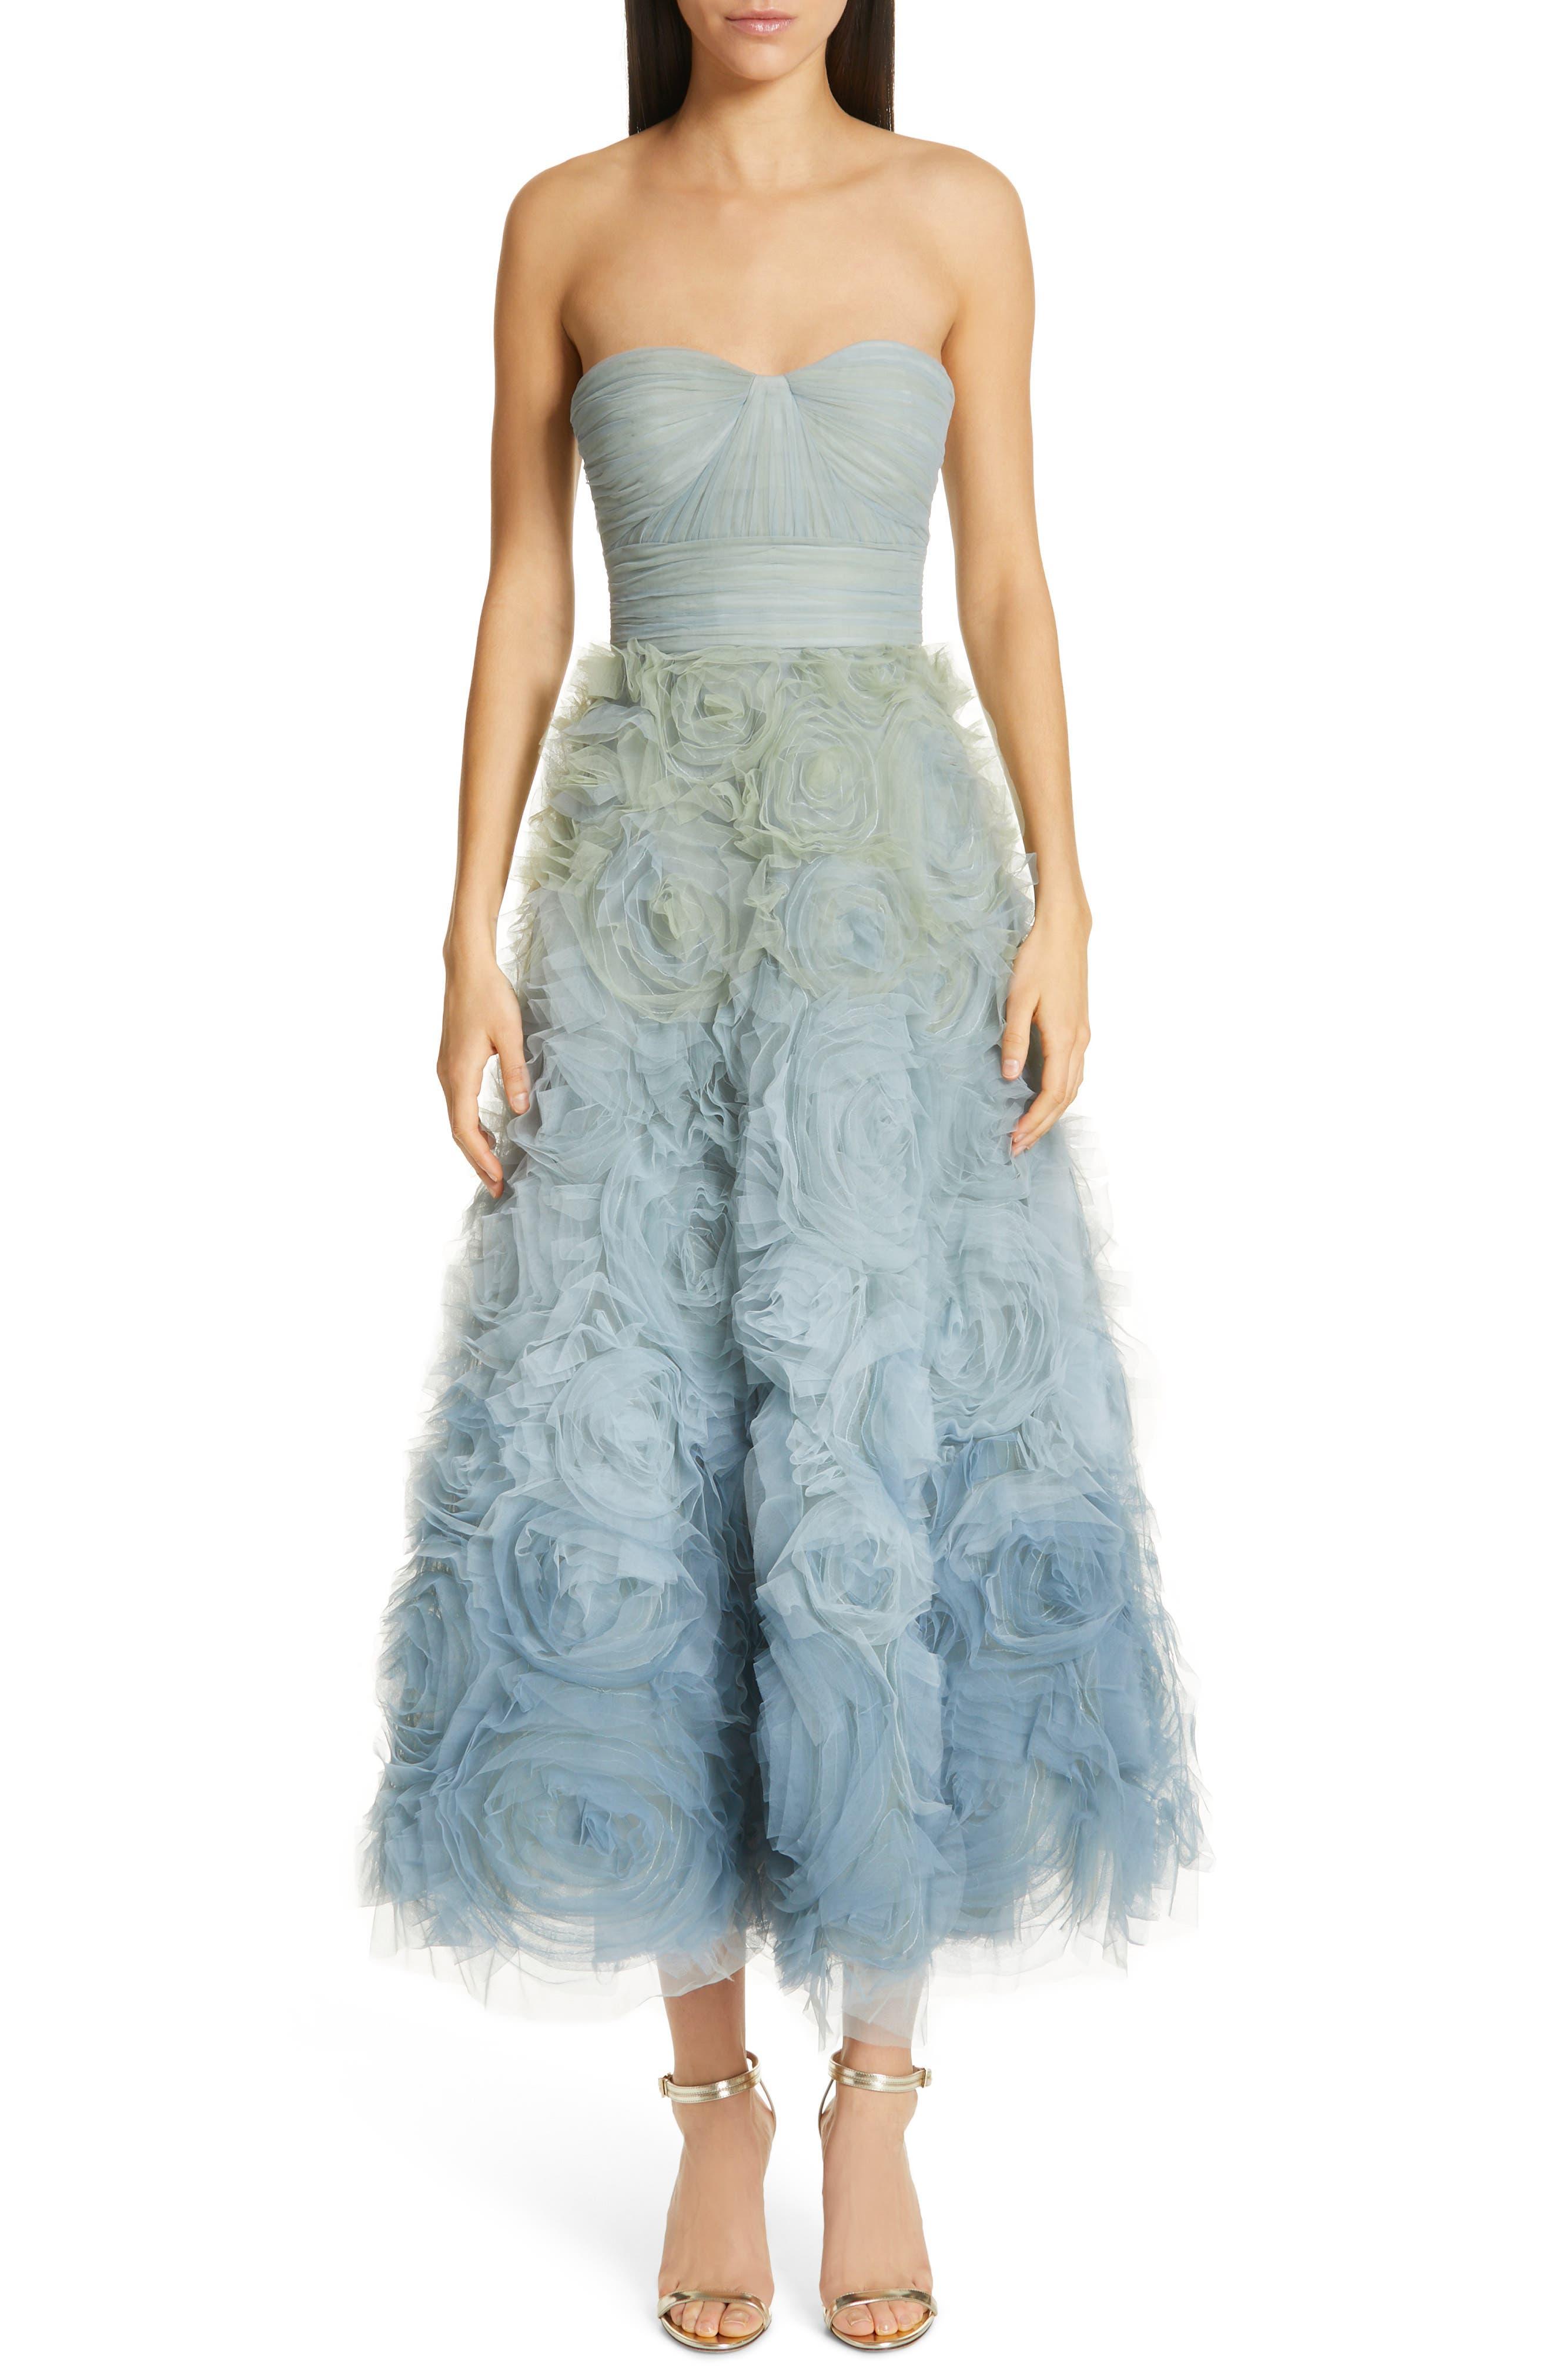 4833aebf6f6 Marchesa Notte Ombre Strapless Evening Dress